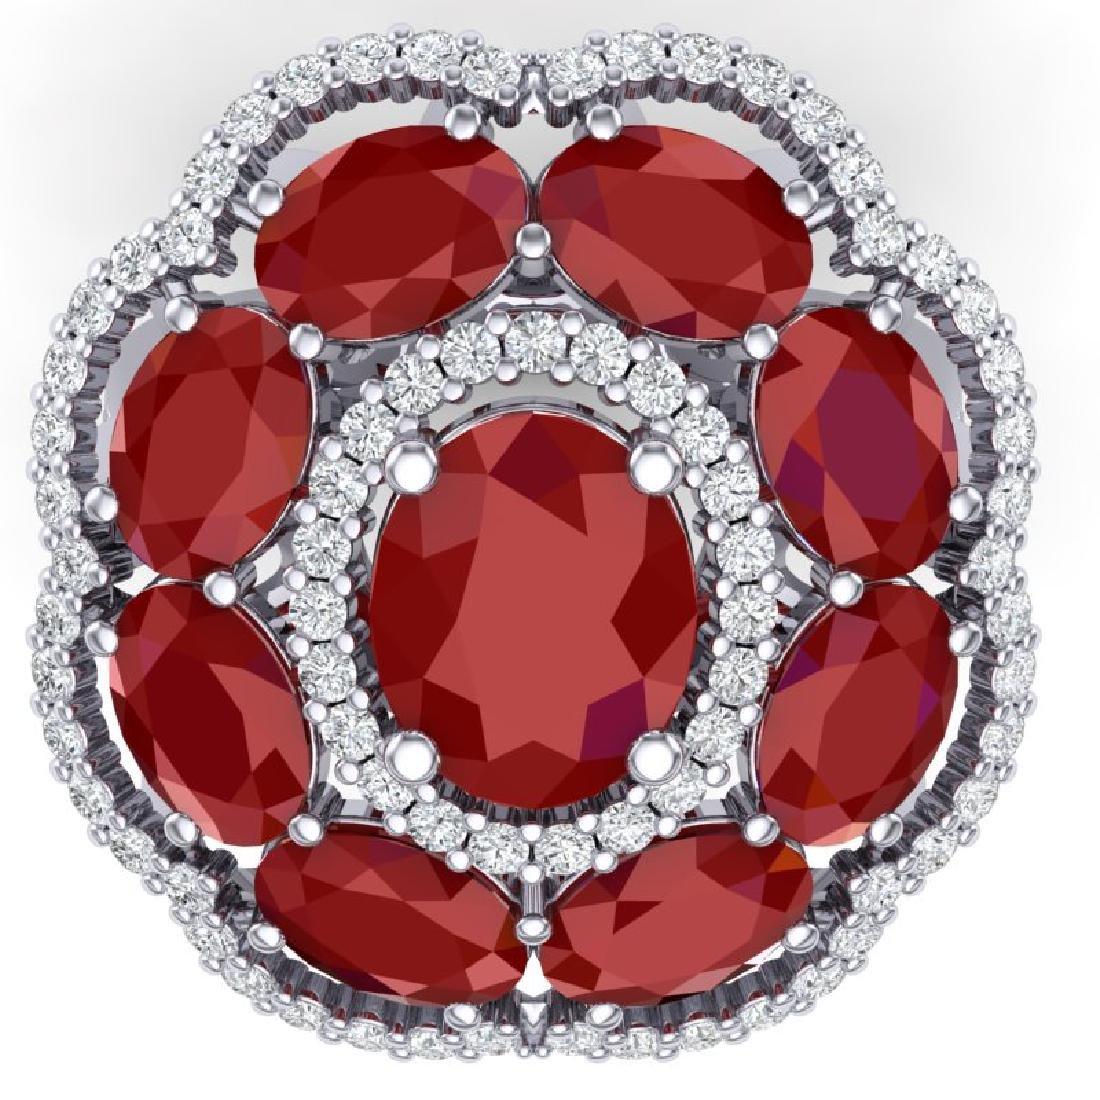 14.4 CTW Royalty Designer Ruby & VS Diamond Ring 18K - 2